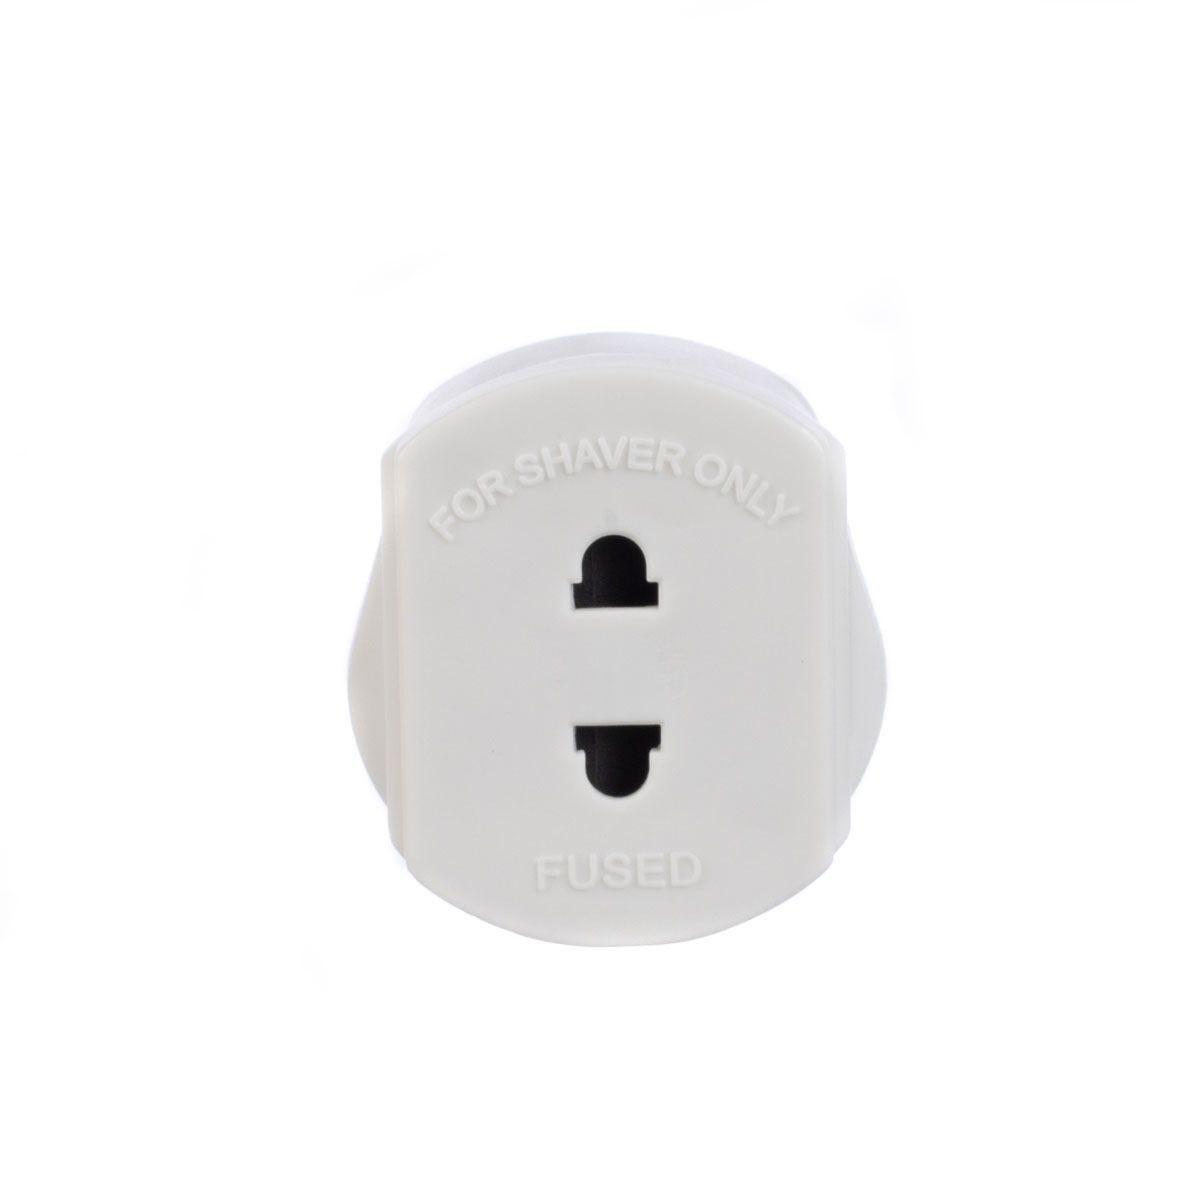 Daewoo Shaver Adaptor Plug - 1 Amp